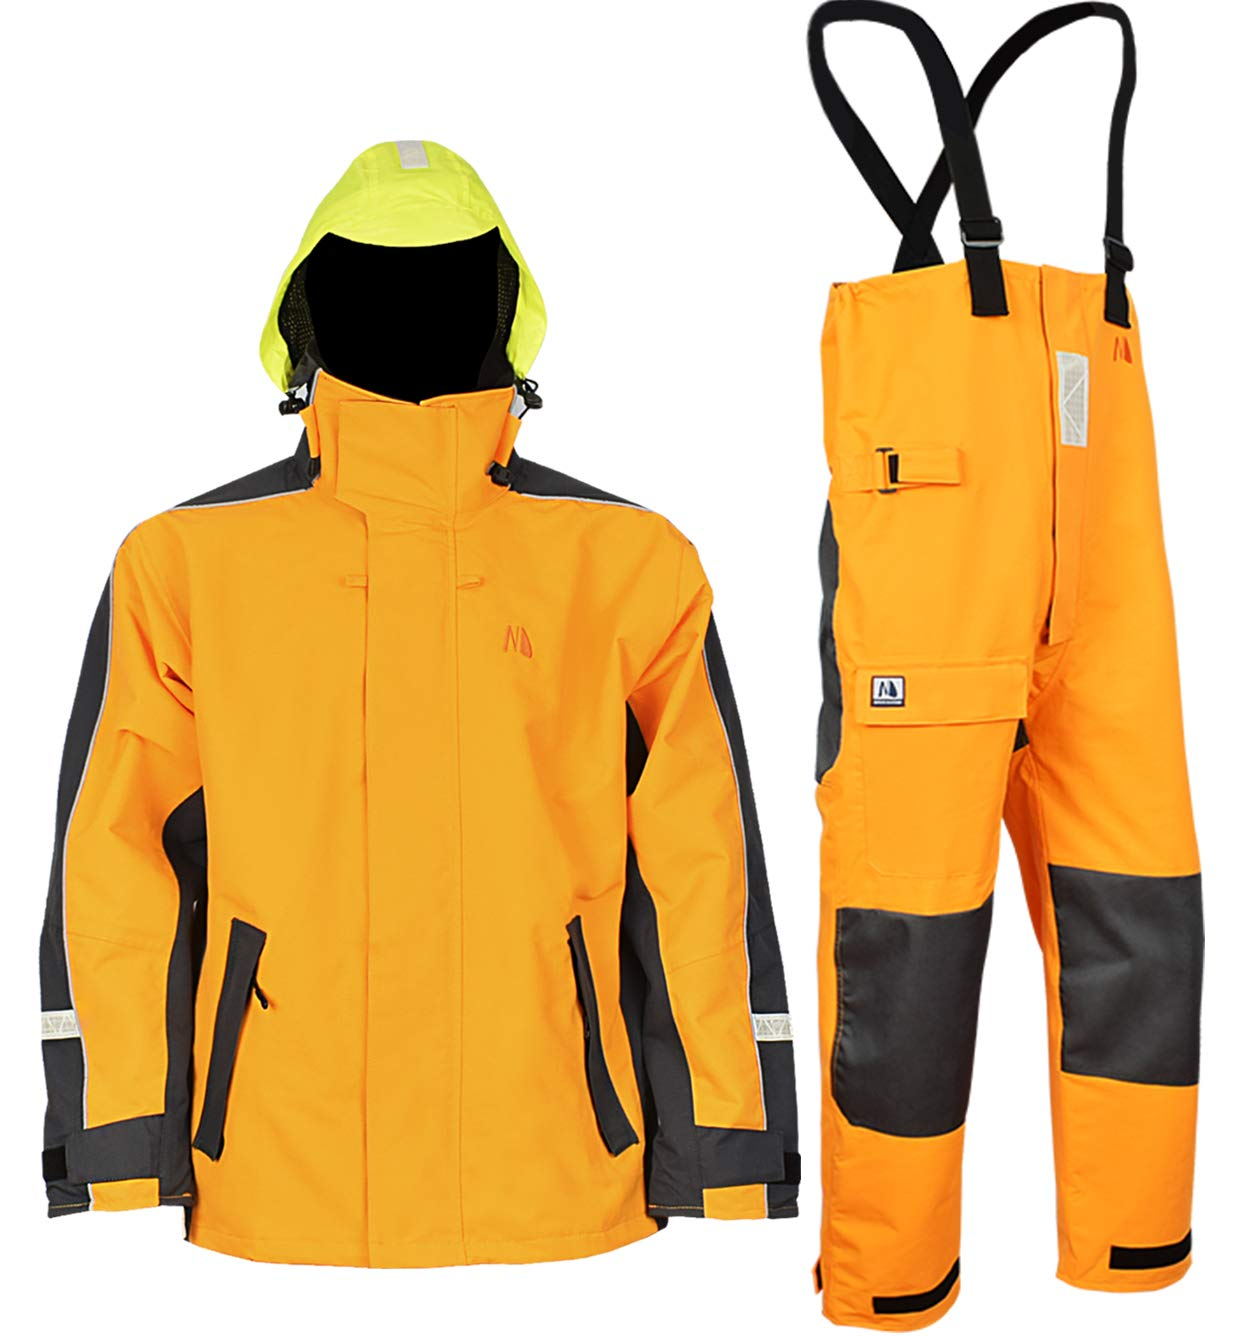 gold XXLarge Navis Marine Waterproof Sailing Jacket and Bib Pants Fishing Foul Weather Gear Rain Suit